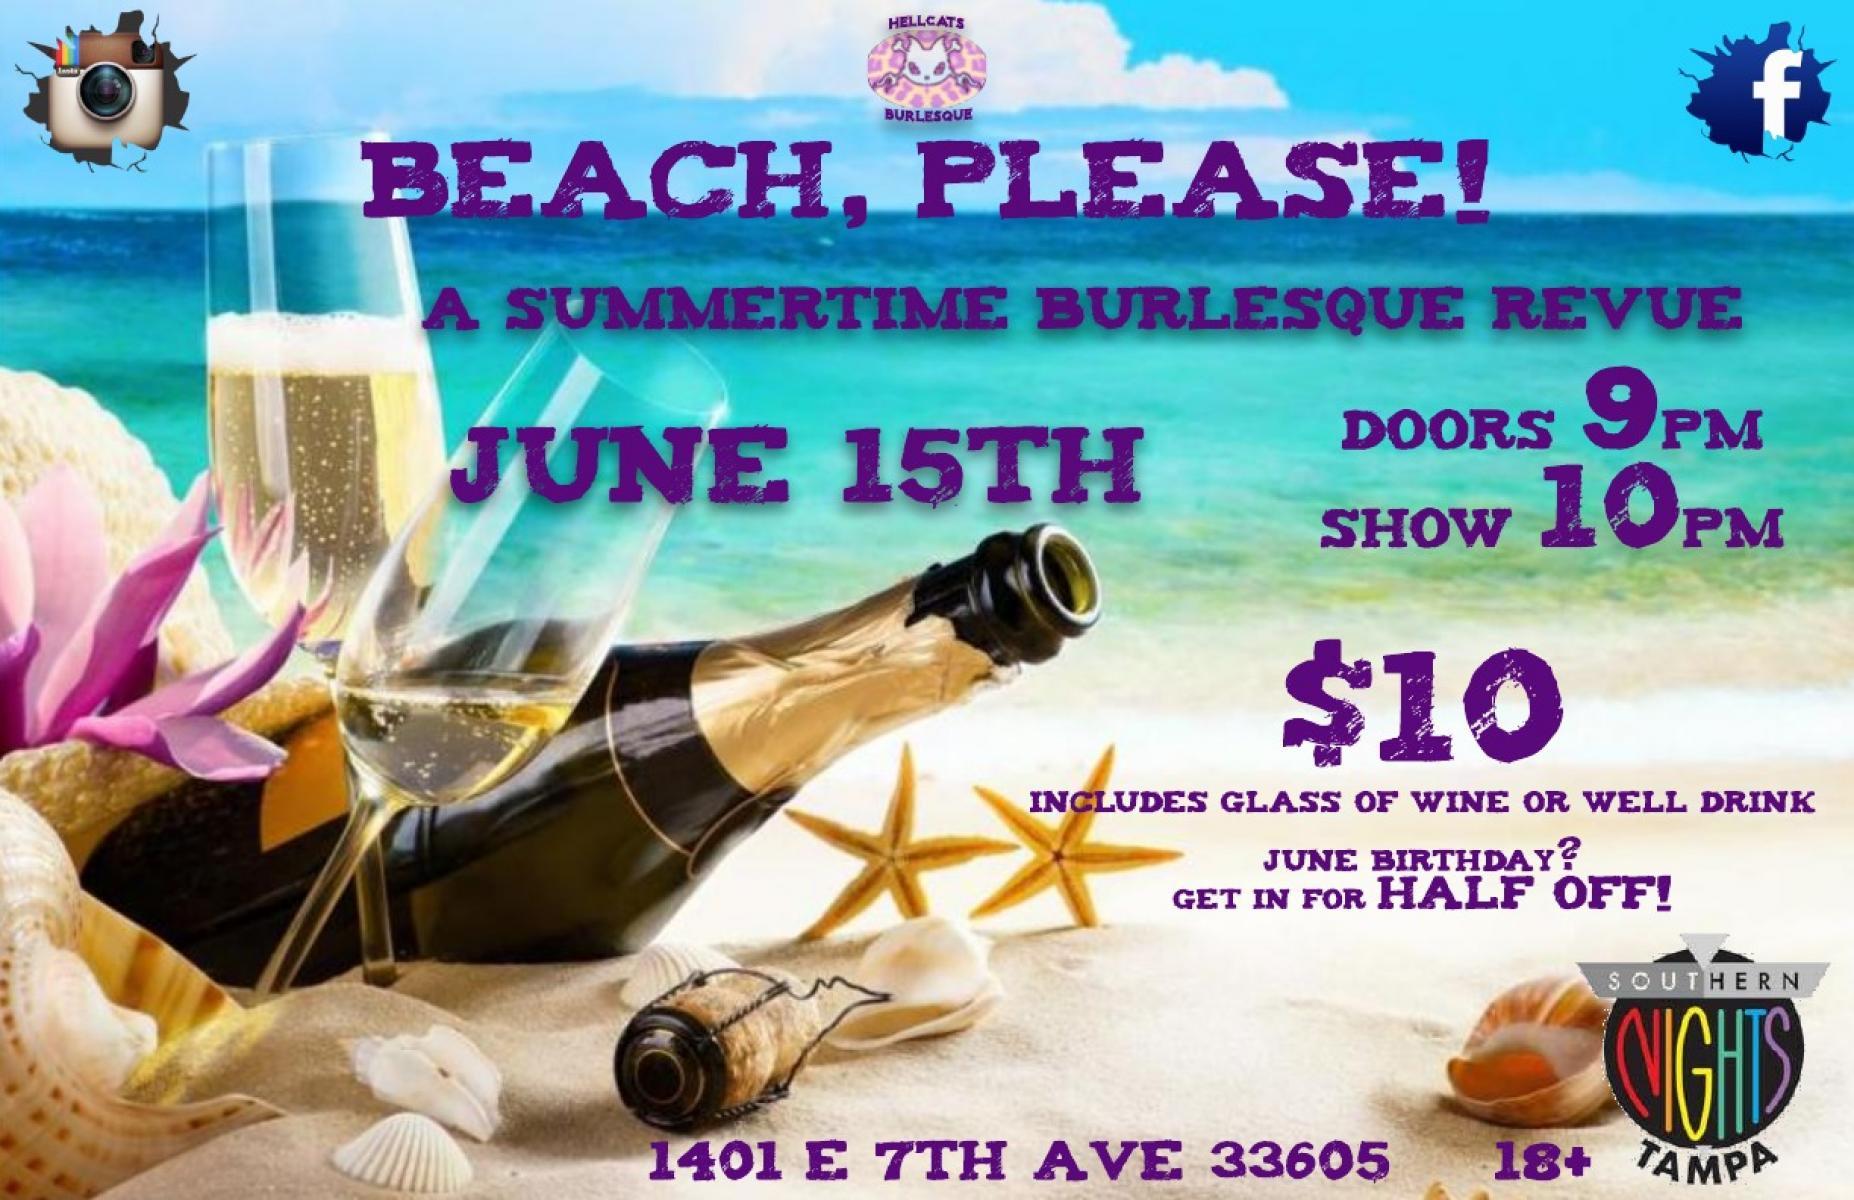 Beach, please! A Summertime Revue